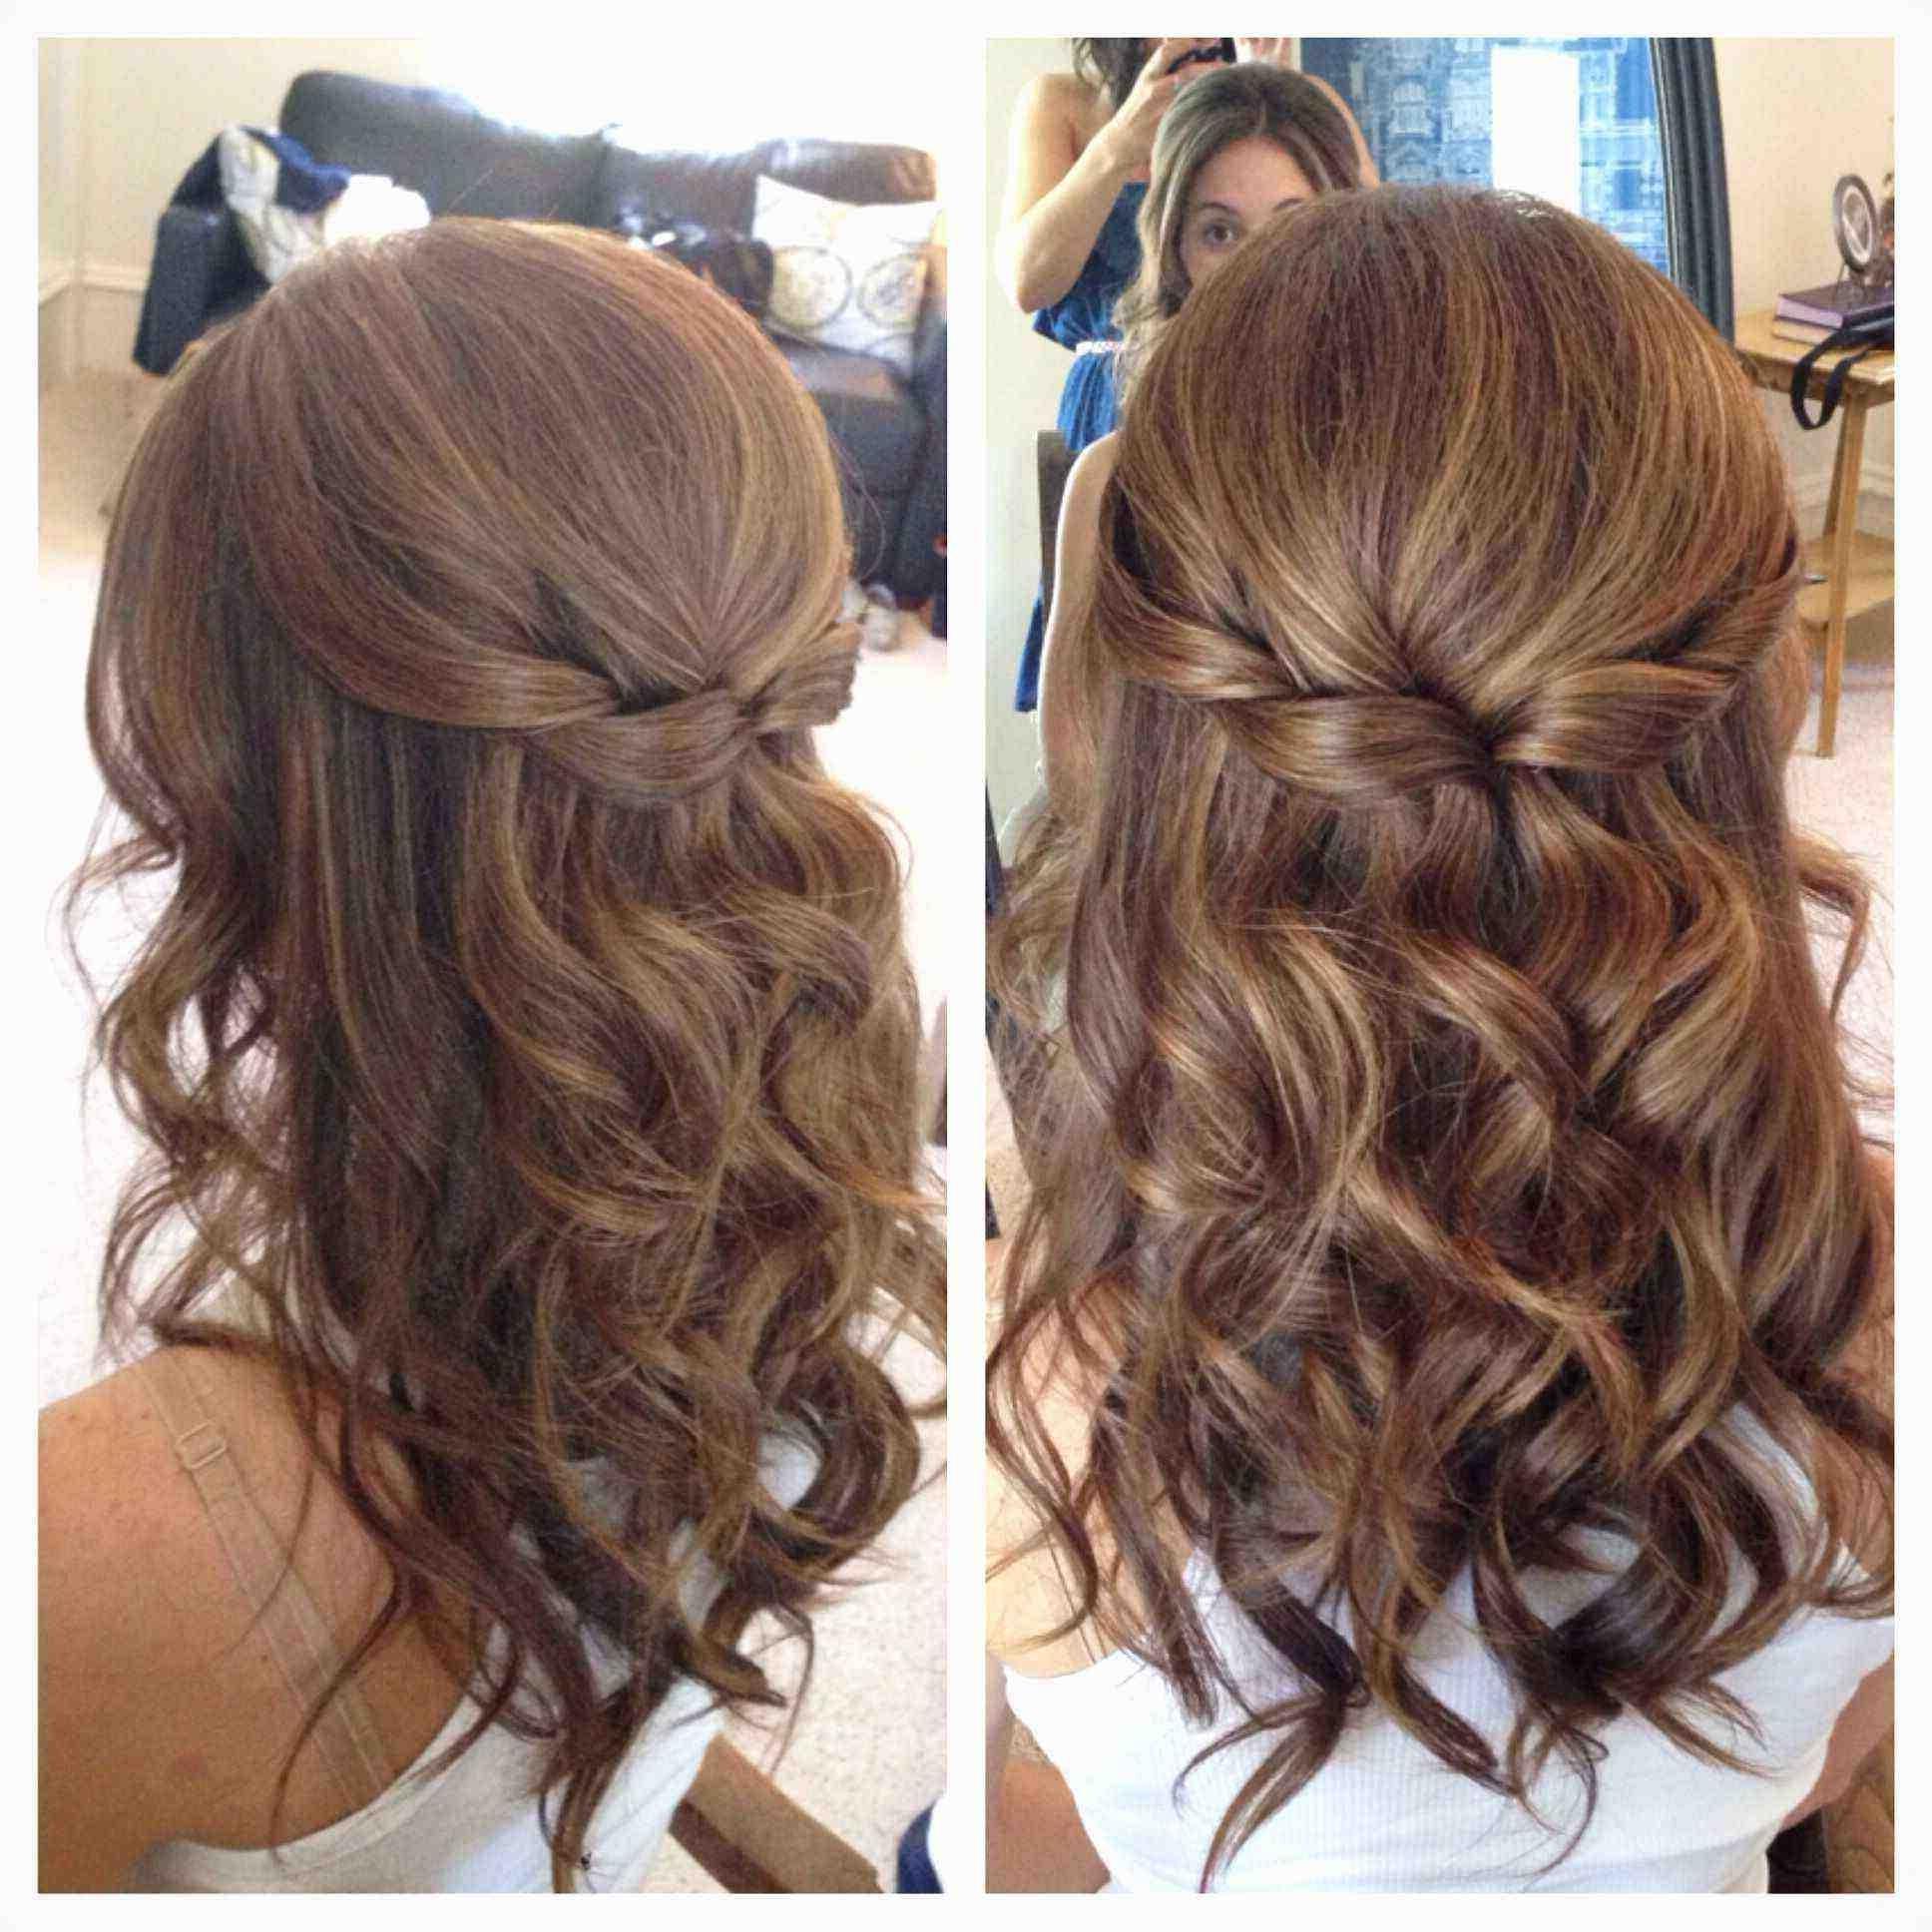 2017 Easy Bridesmaid Hairstyles For Medium Length Hair With Easy Wedding Hairstyles For Medium Length Hair Elegant Simple (View 12 of 15)